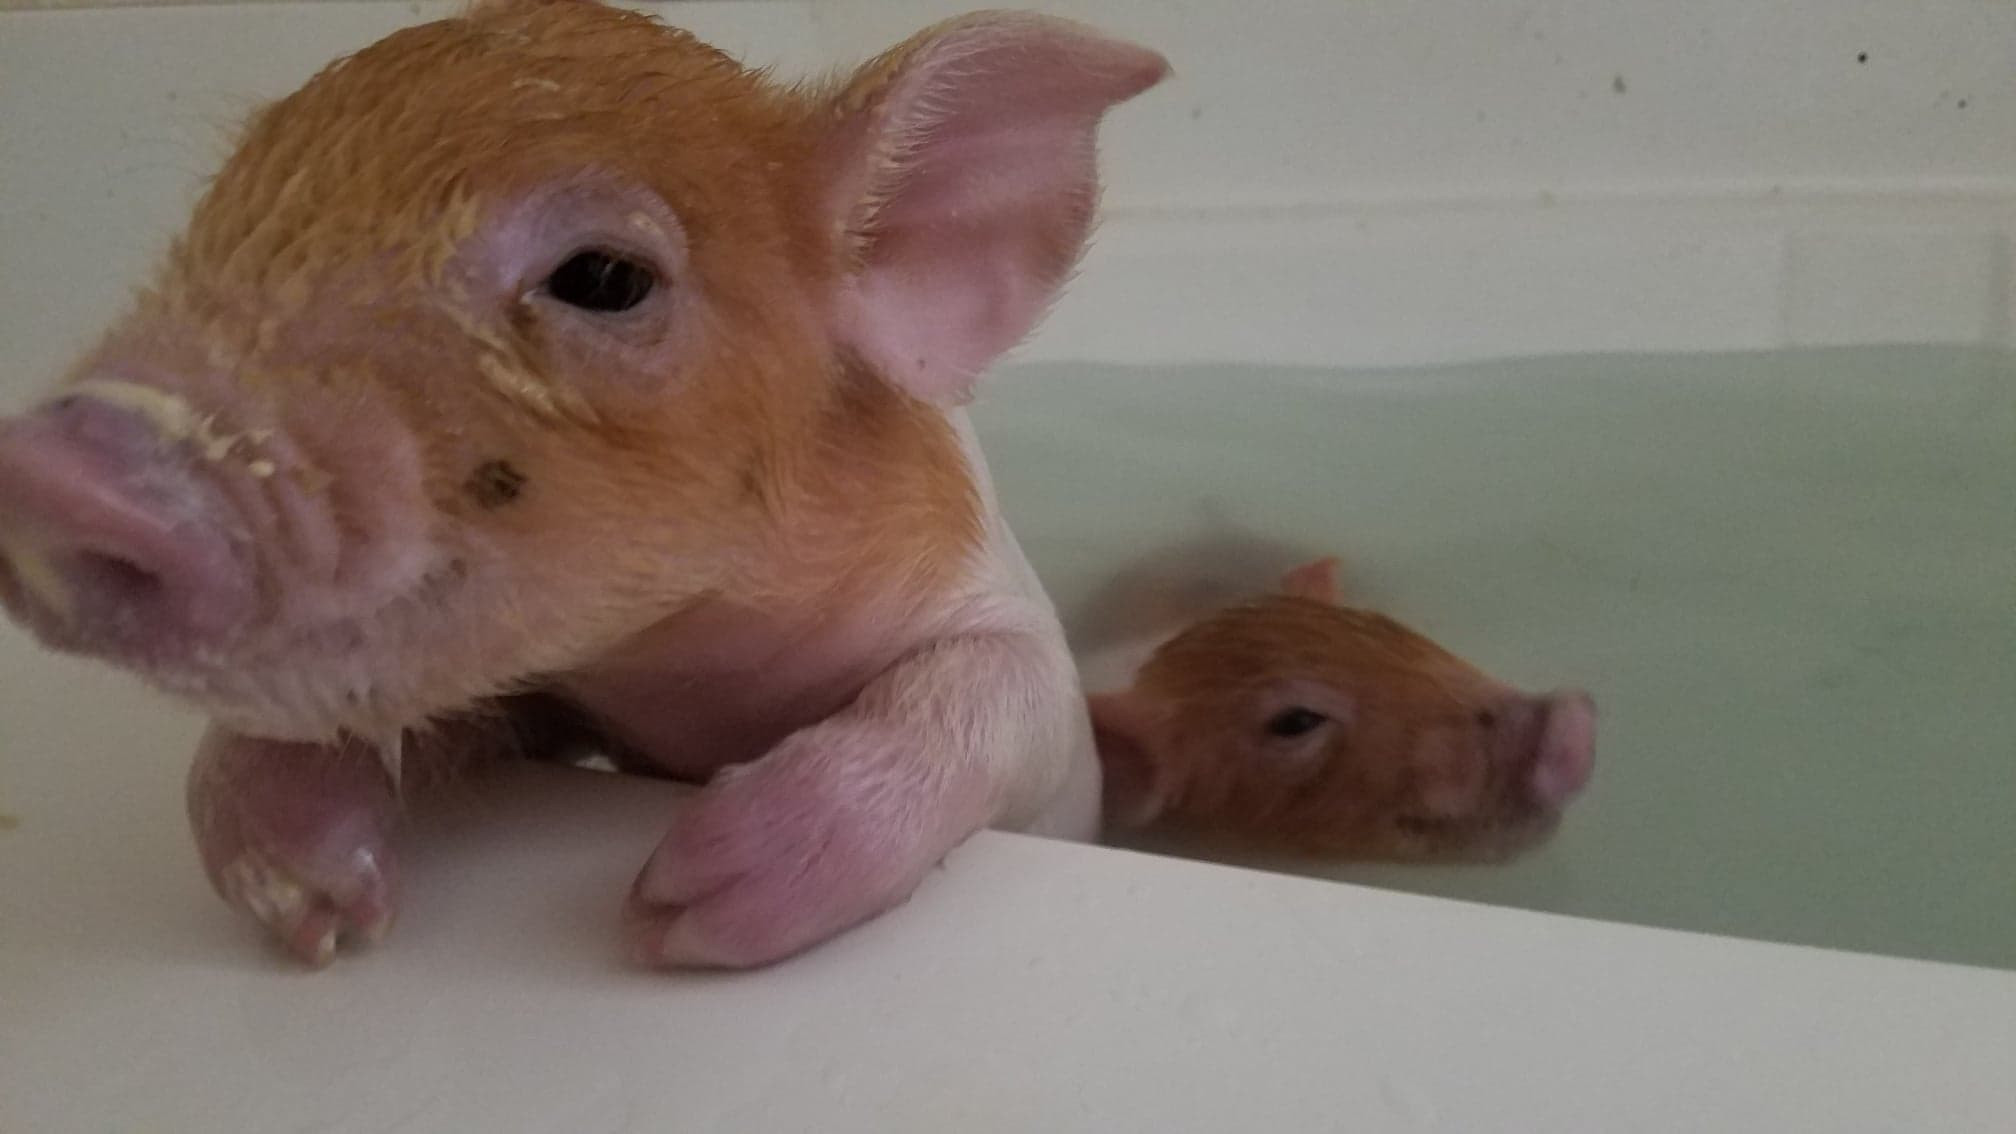 Just taking a swim